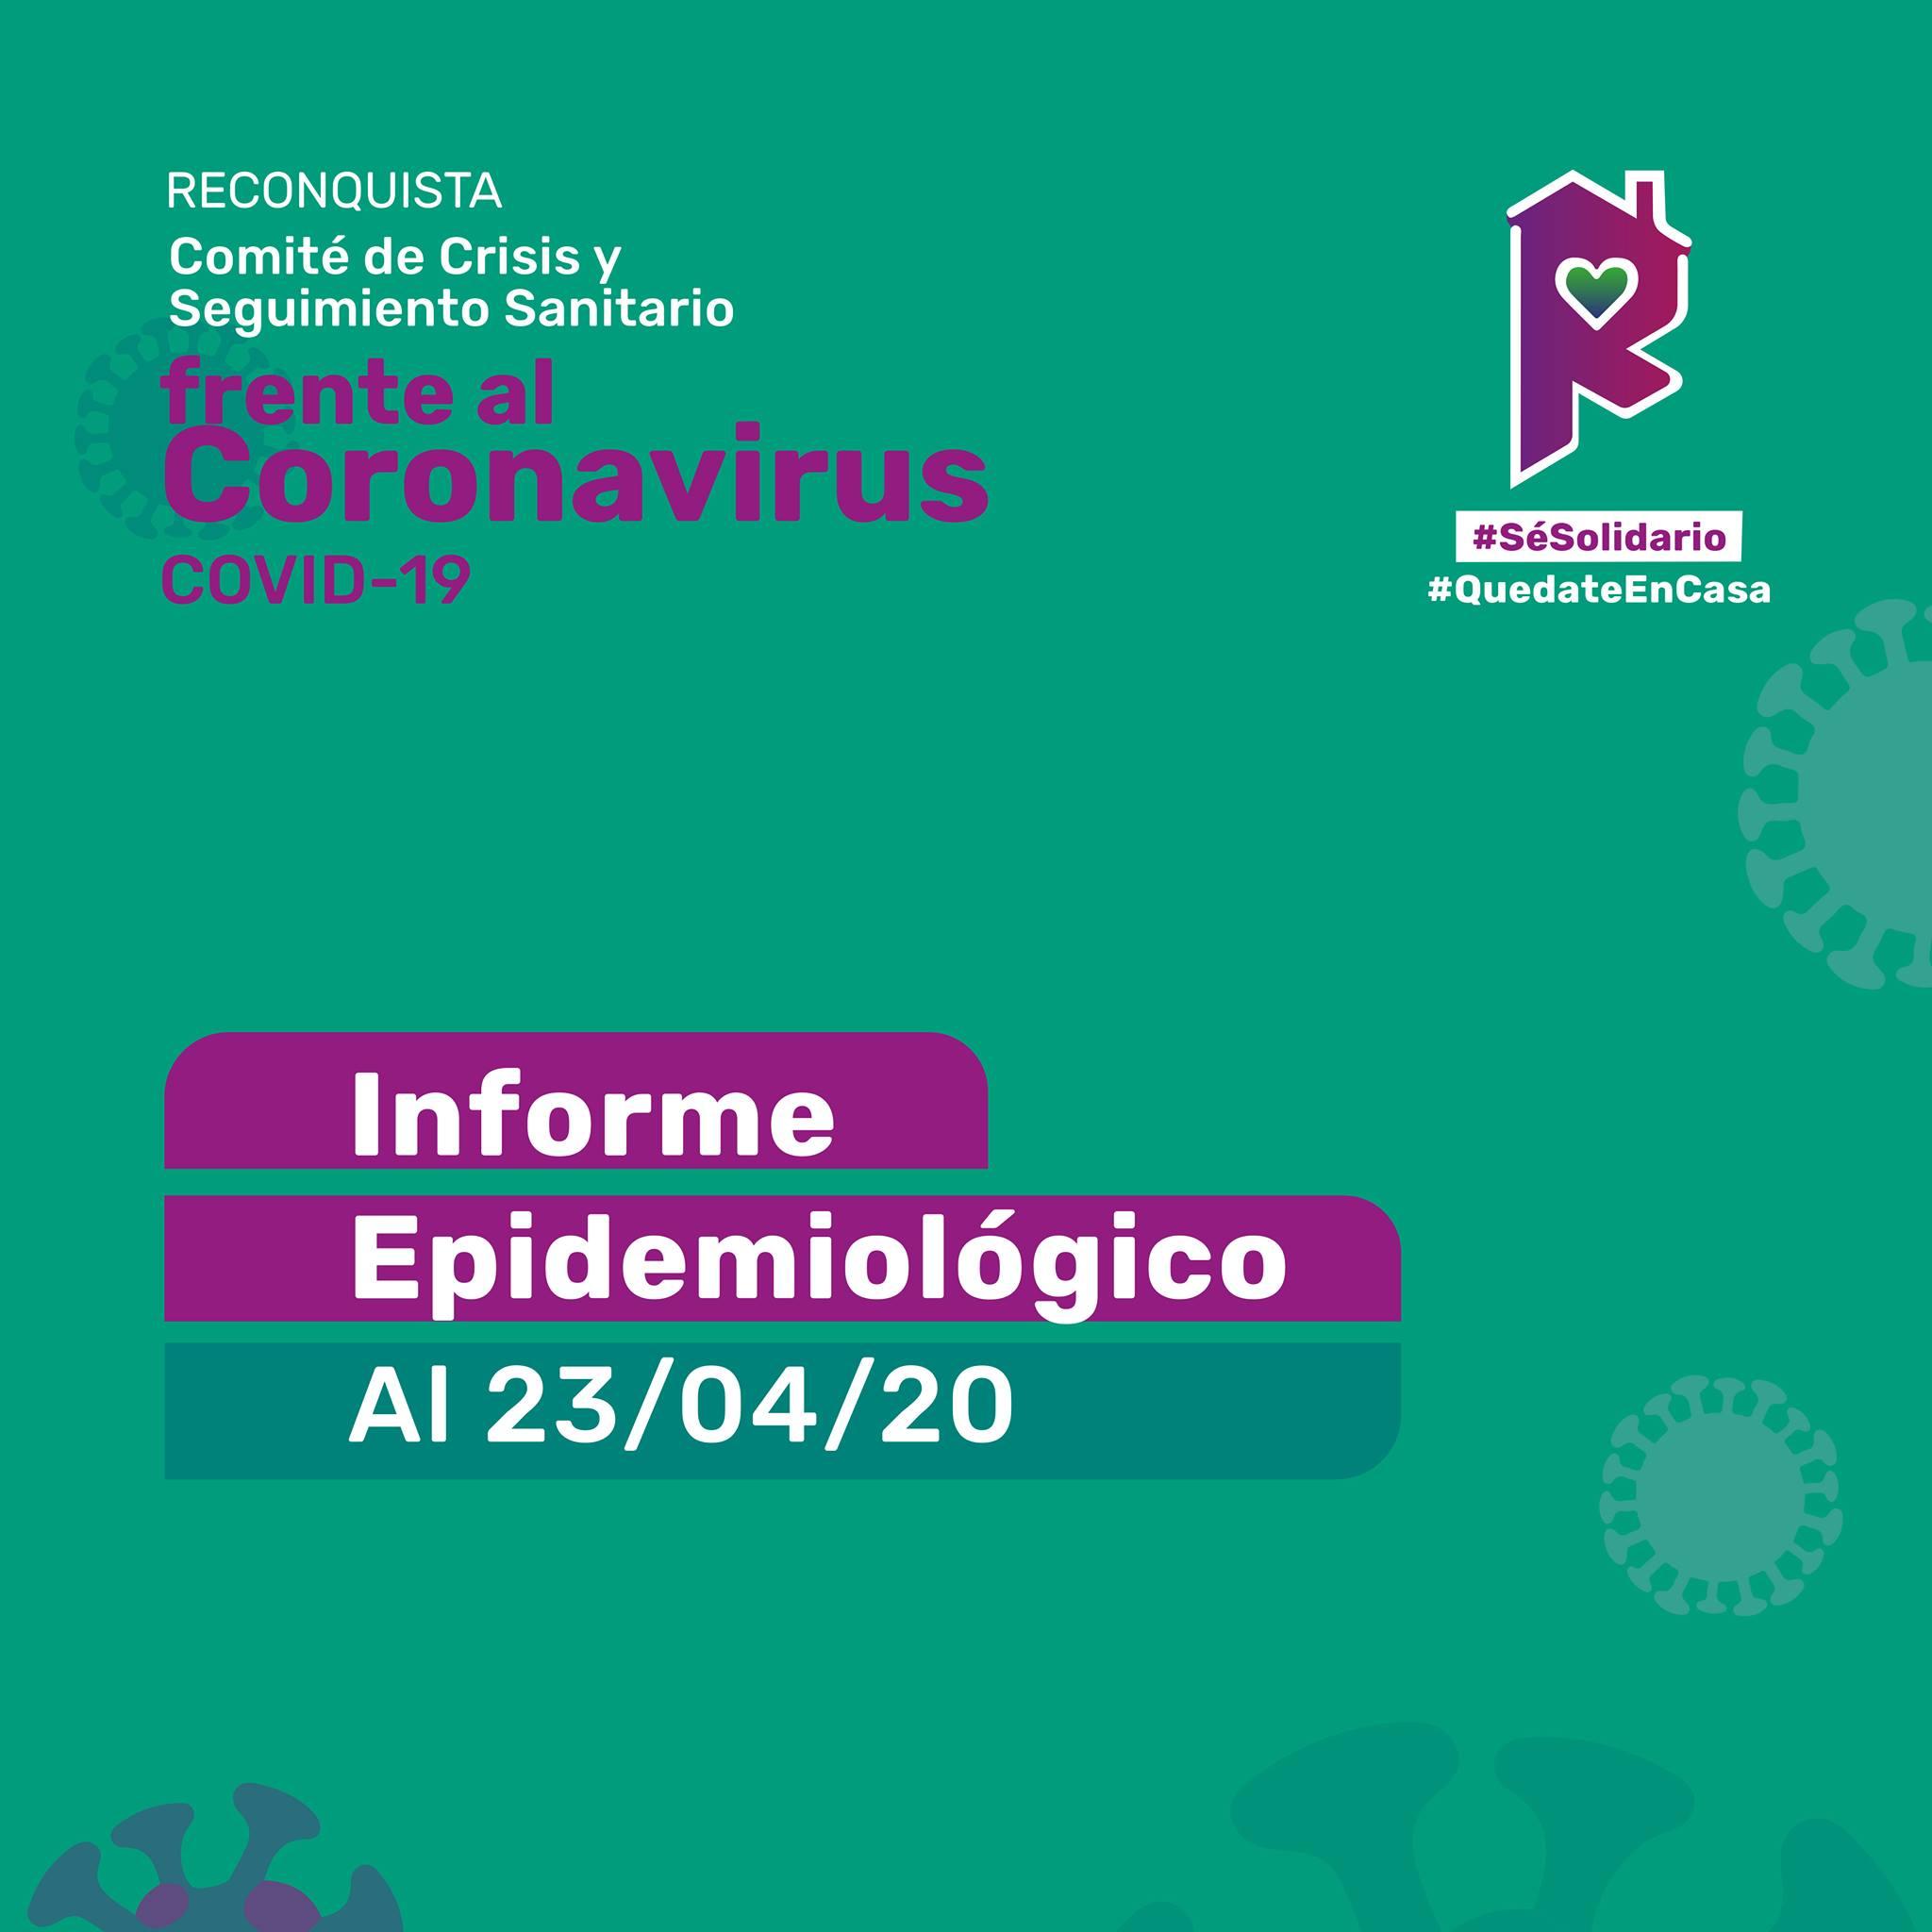 Reconquista: informe epidemiológico al 23 de abril a las 8 h